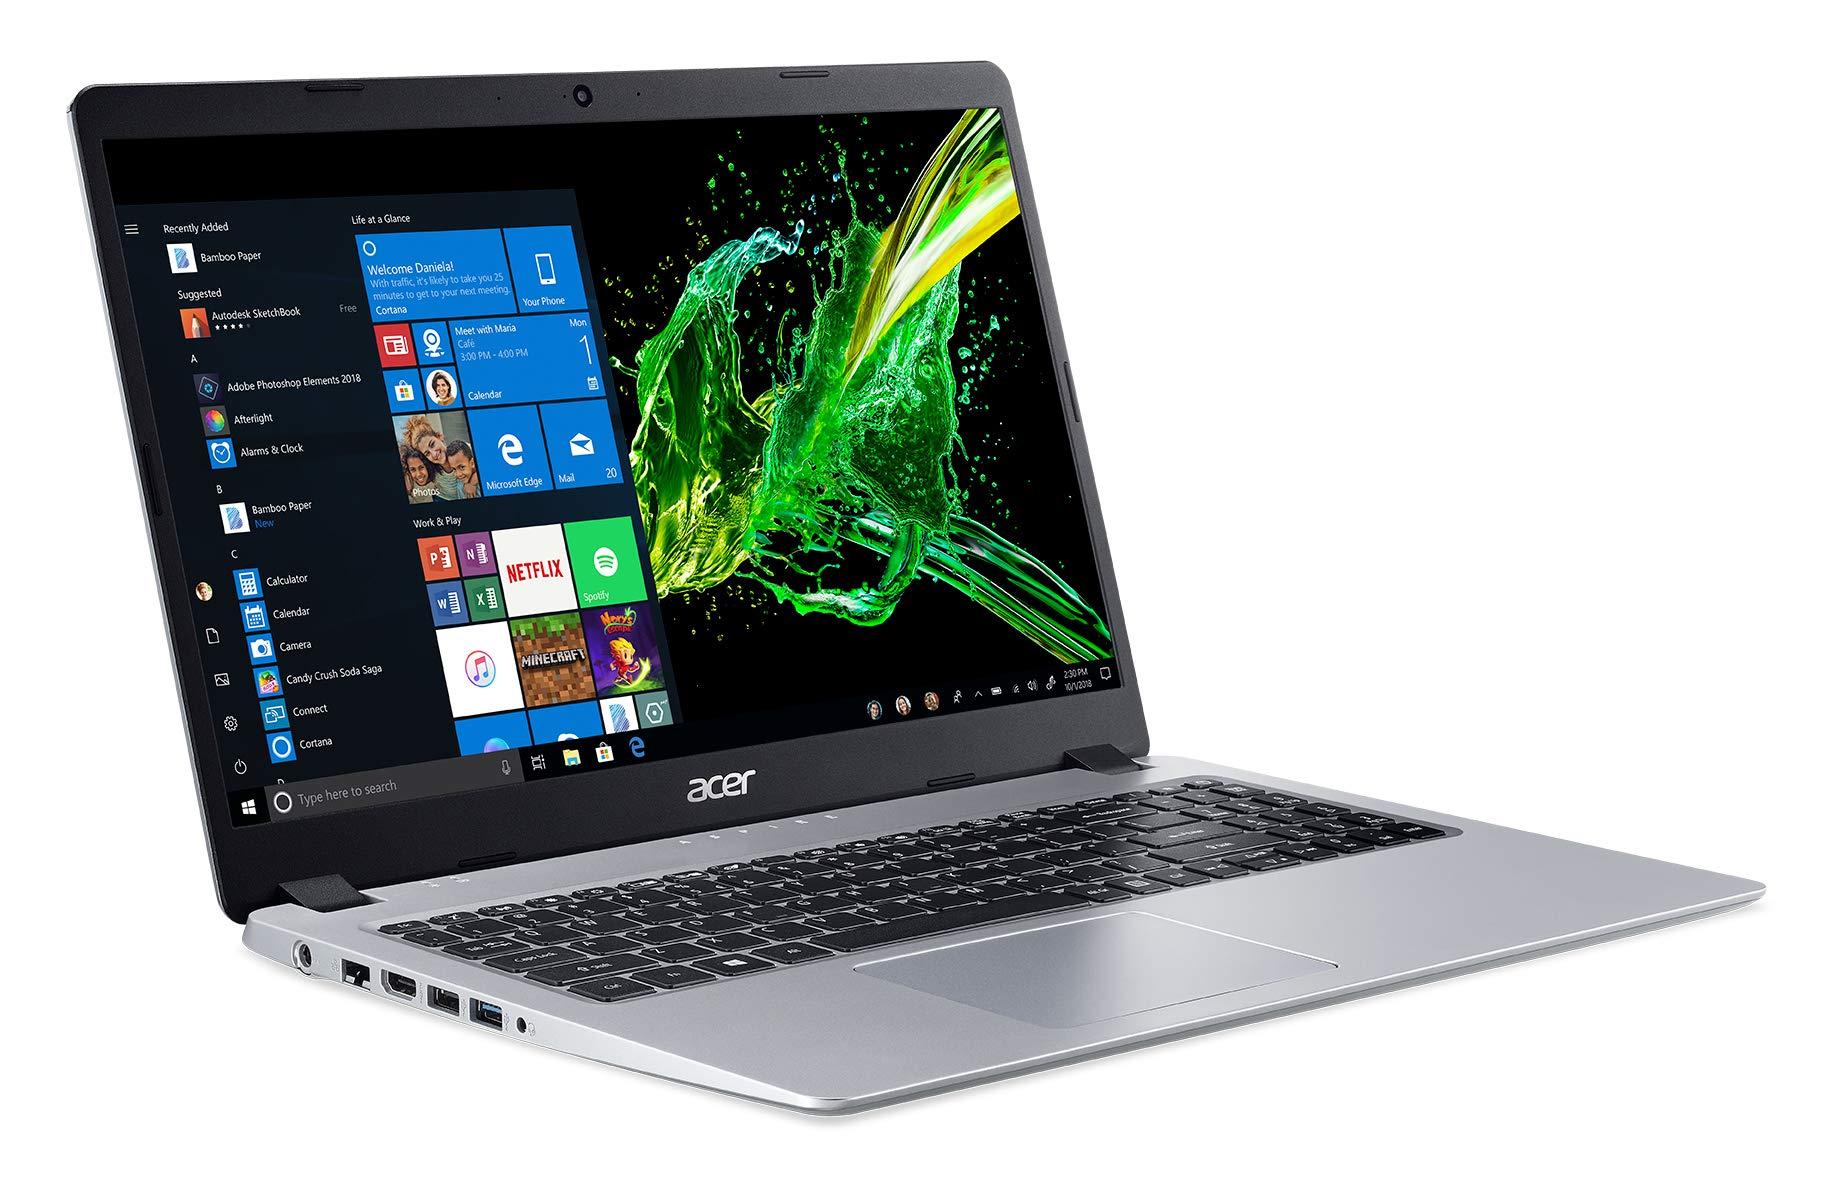 Acer Aspire 5 Slim Laptop, 15.6'' Full HD IPS Display, AMD Ryzen 3 3200U, Vega 3 Graphics, 4GB DDR4, 128GB SSD, Backlit Keyboard, Windows 10 in S Mode, A515-43-R19L by Acer